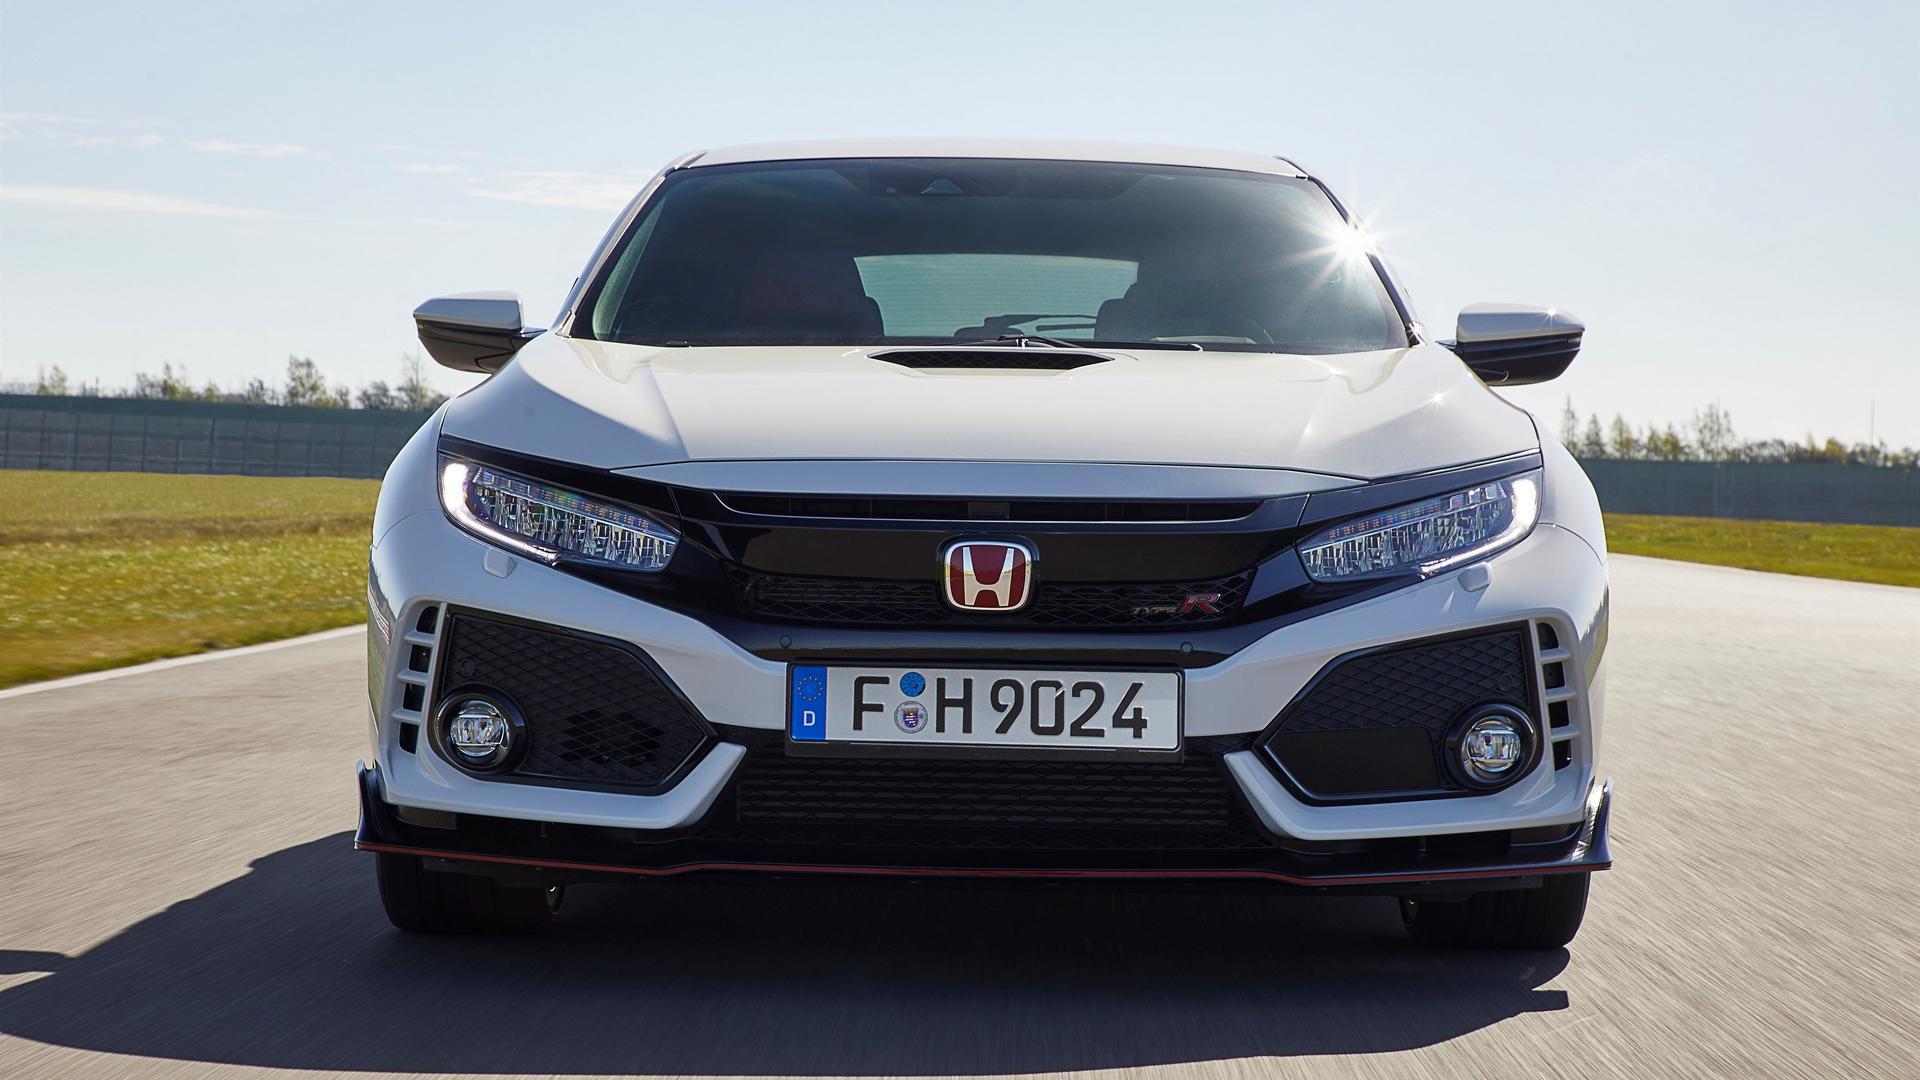 Honda Civic Type R Stars In New Gallery Videos Of Euro Model